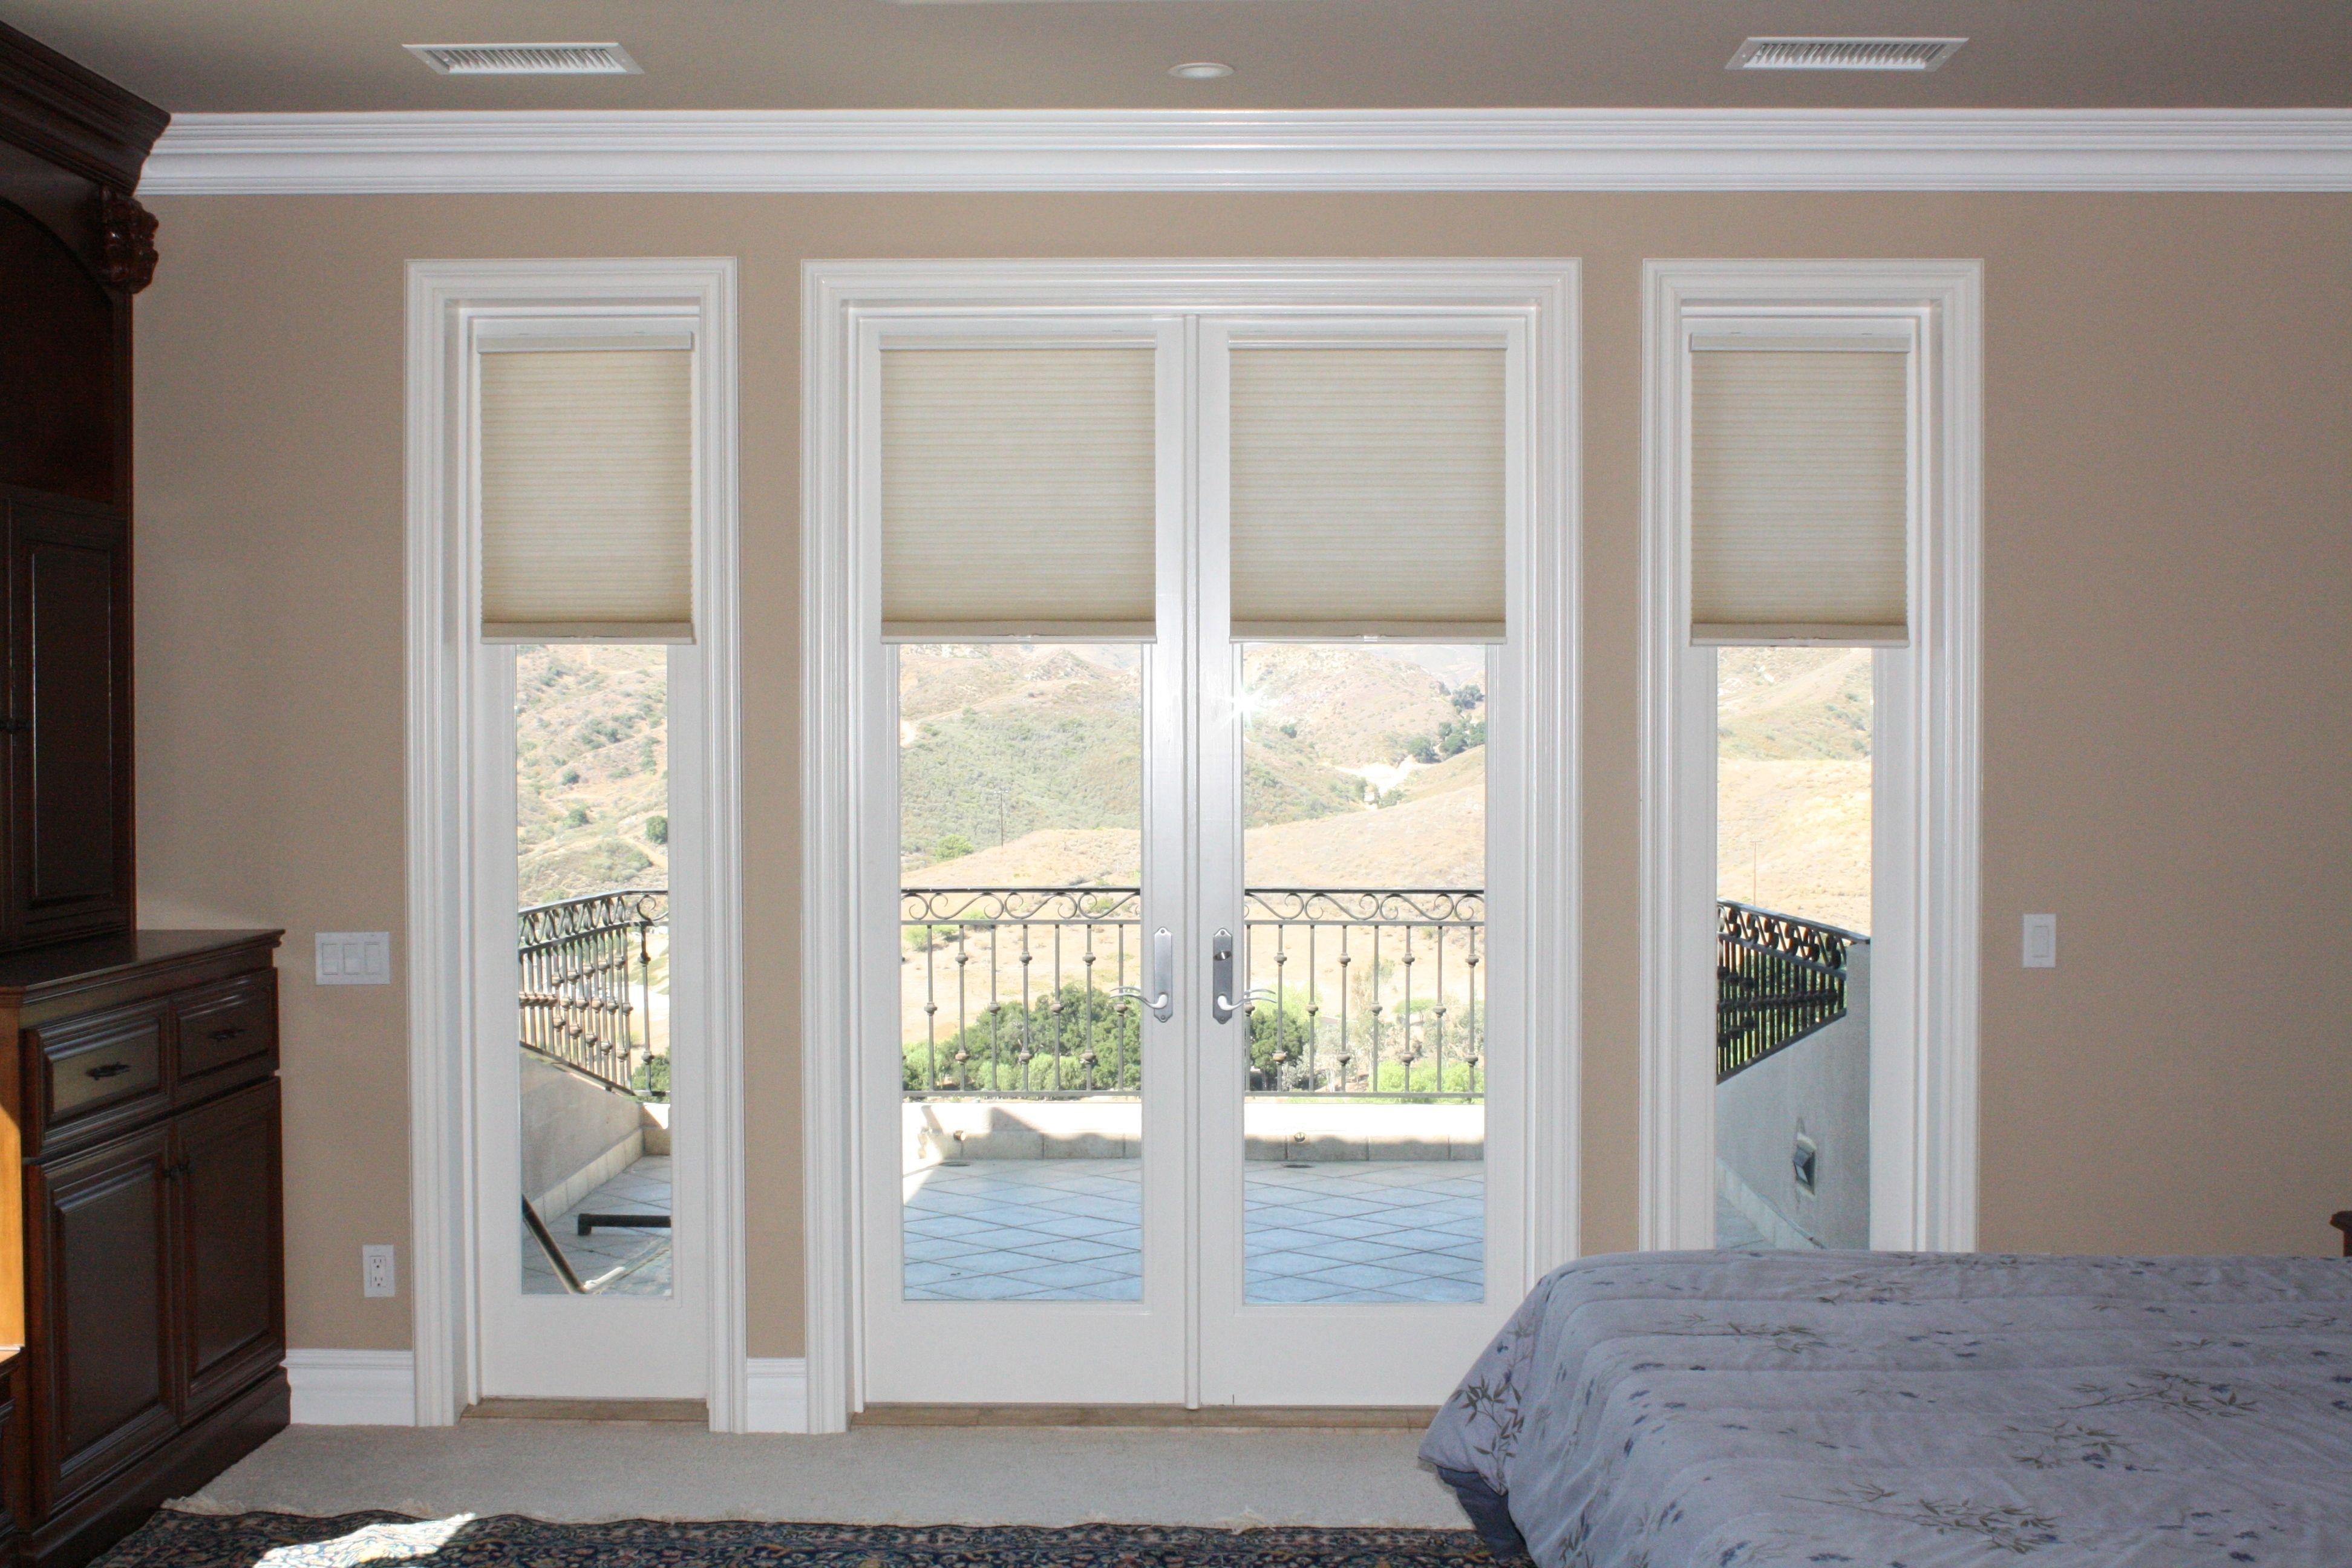 Cellular blinds for patio doors patio decor pinterest cellular